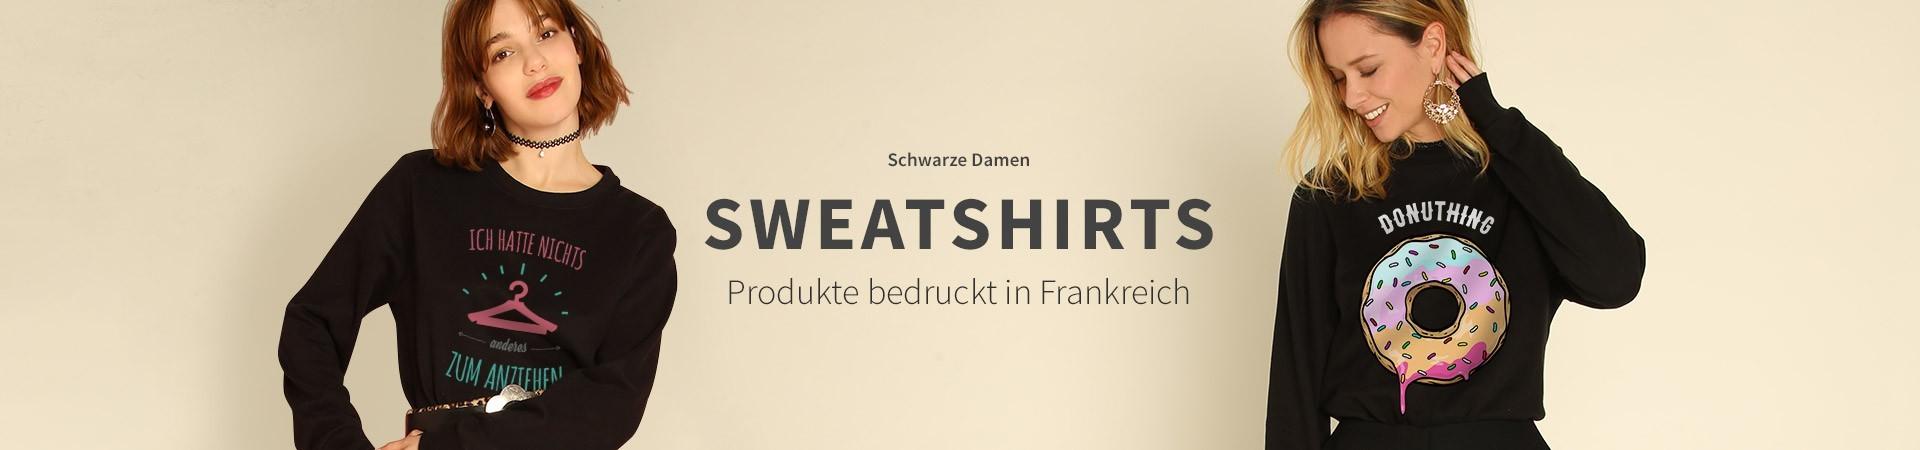 Schwarze Sweatshirts